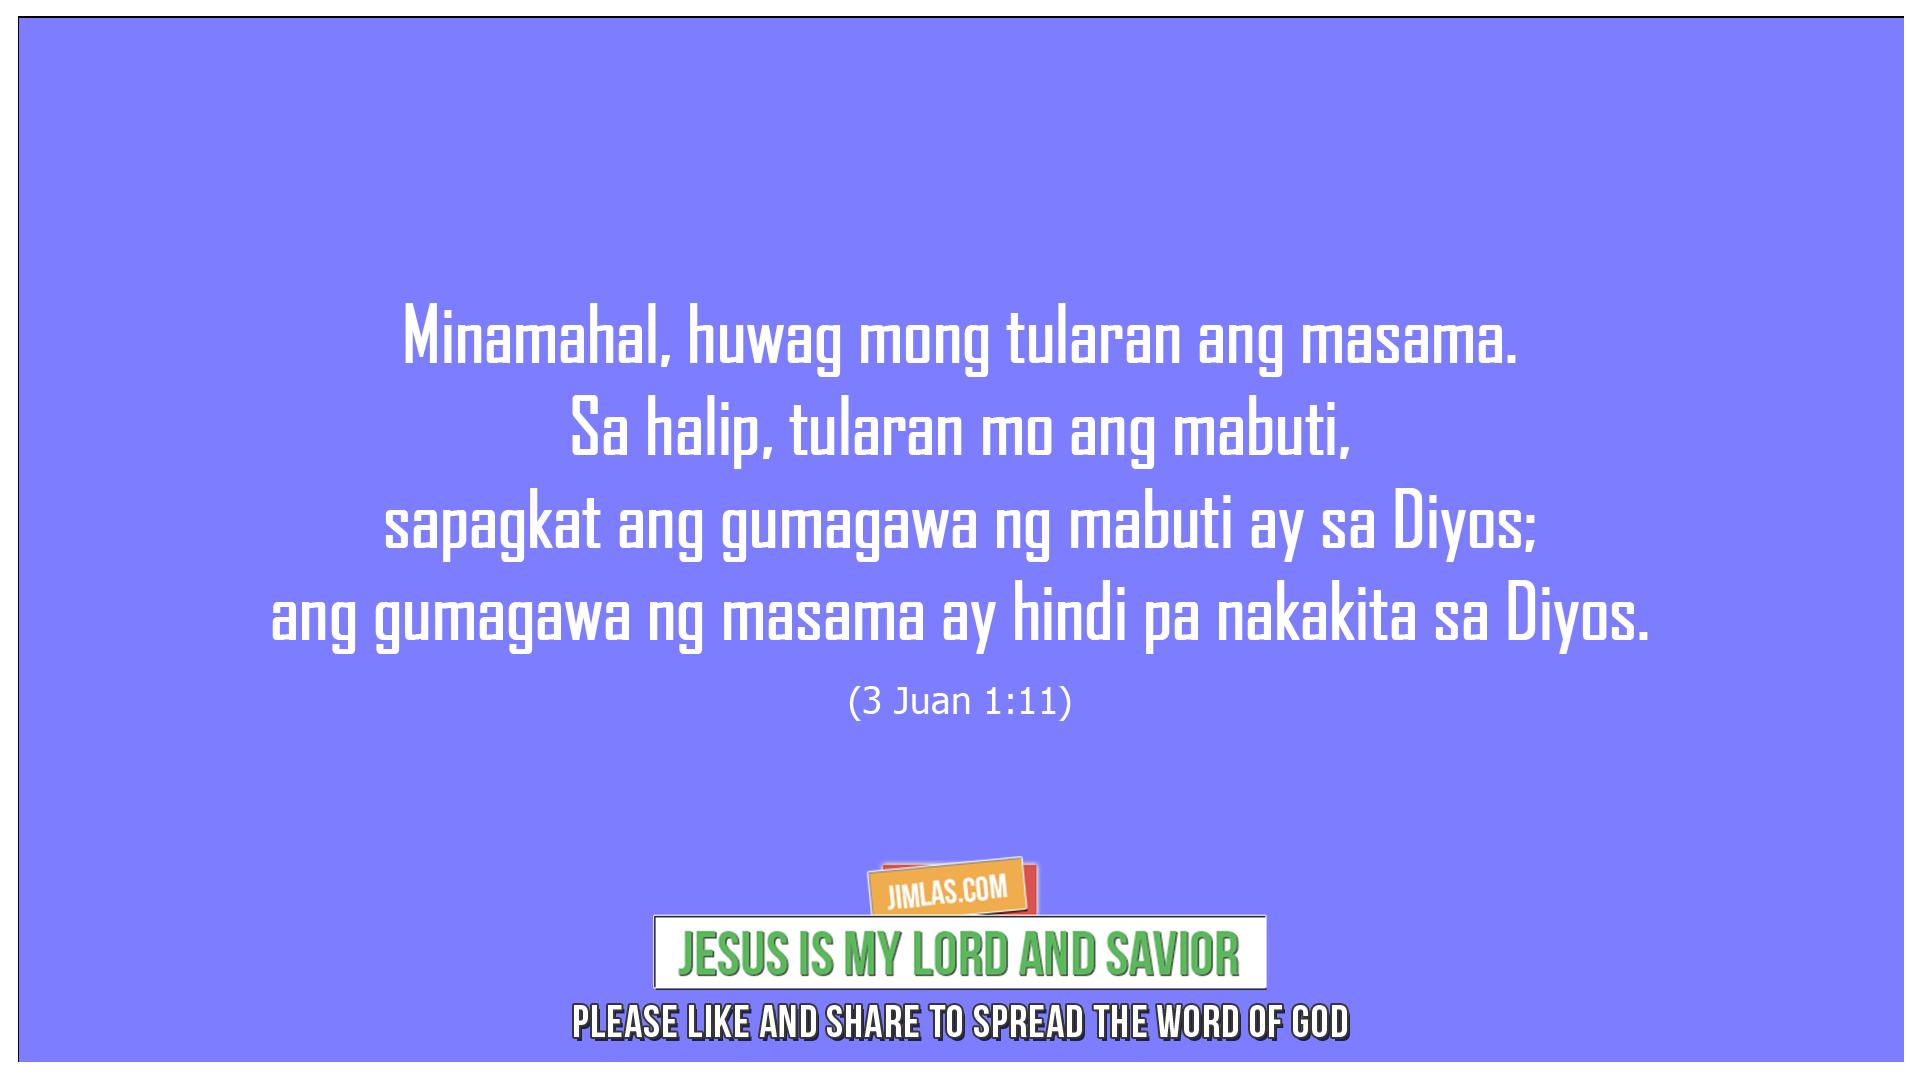 3 Juan 1:11, 3 Juan 1:11